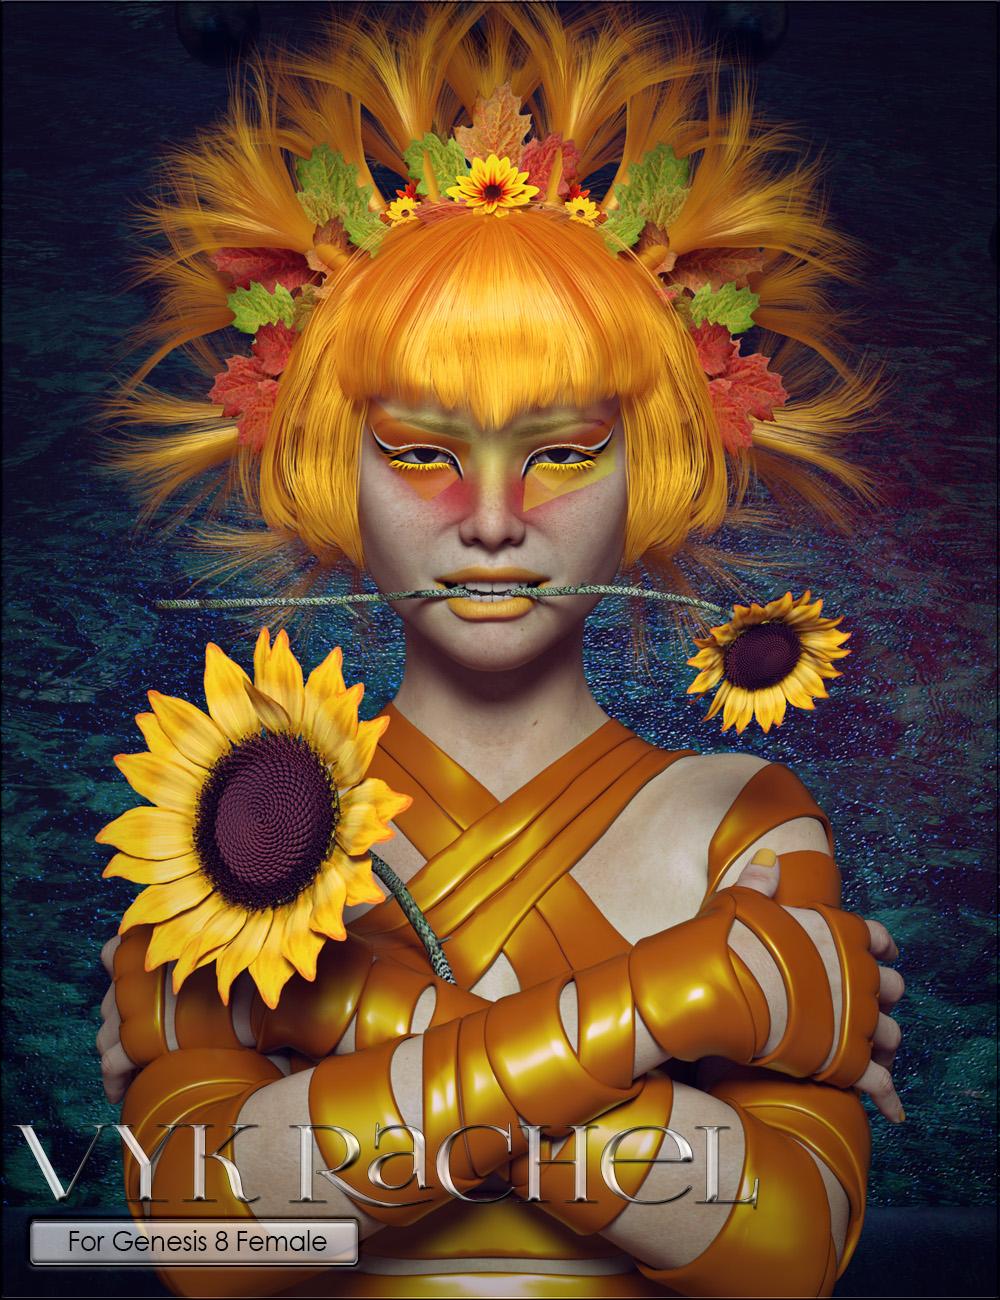 VYK Rachel for Genesis 8 Female by: vyktohria, 3D Models by Daz 3D